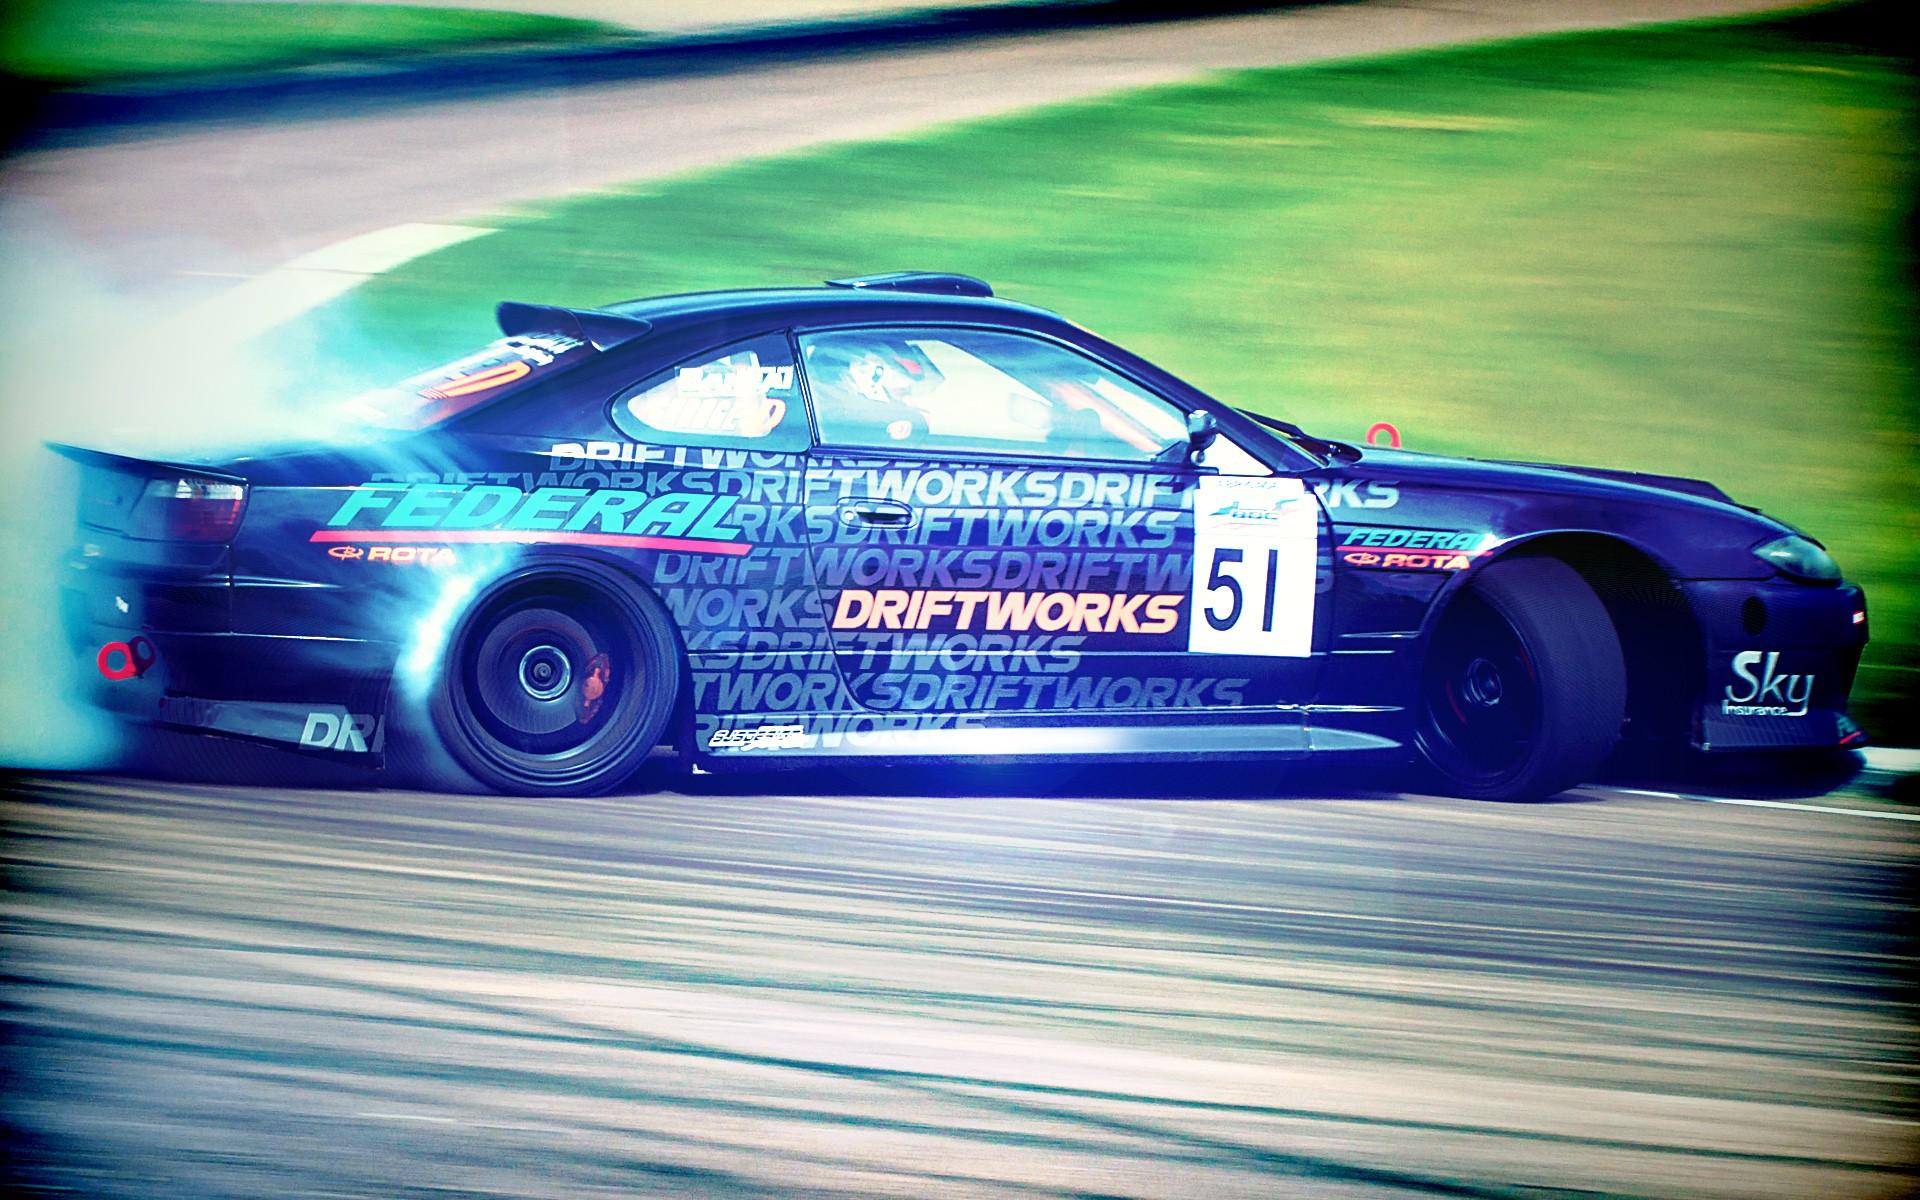 Cars Drift Wallpaper 1920x1200 Cars Drift Racing Nissan Silvia 1920x1200